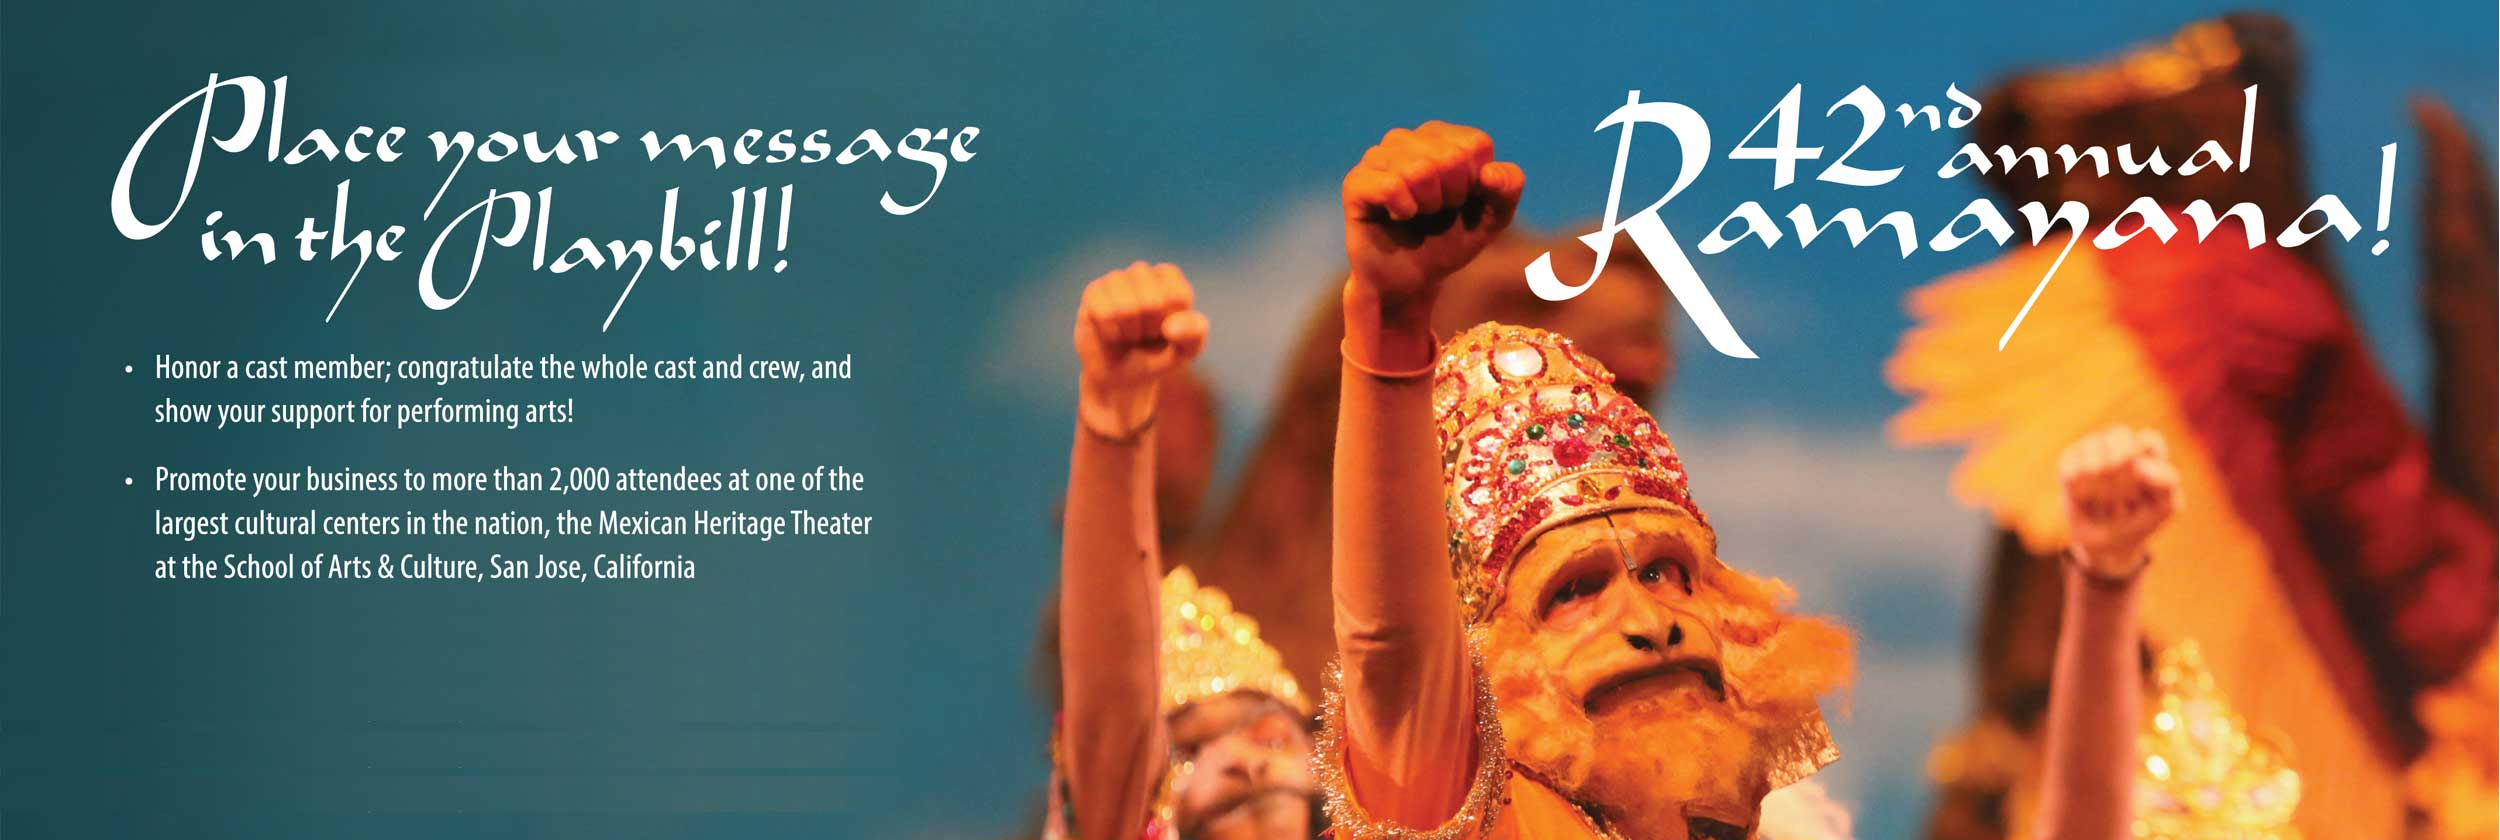 42nd annual ramayana playbill advertising